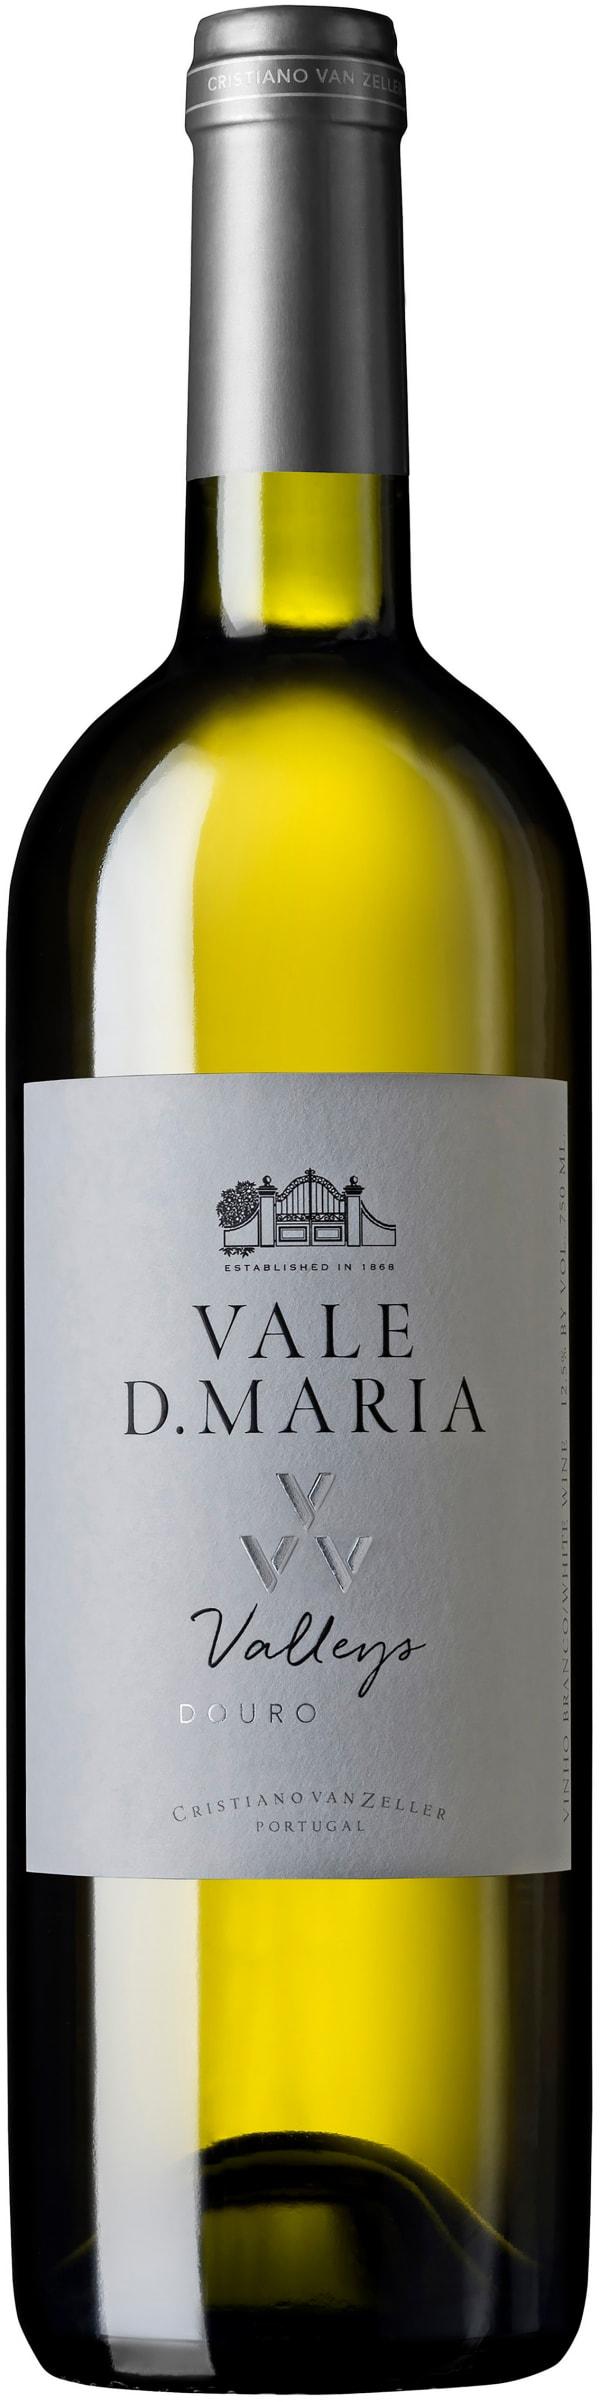 Vale D. Maria VVV Branco 2016